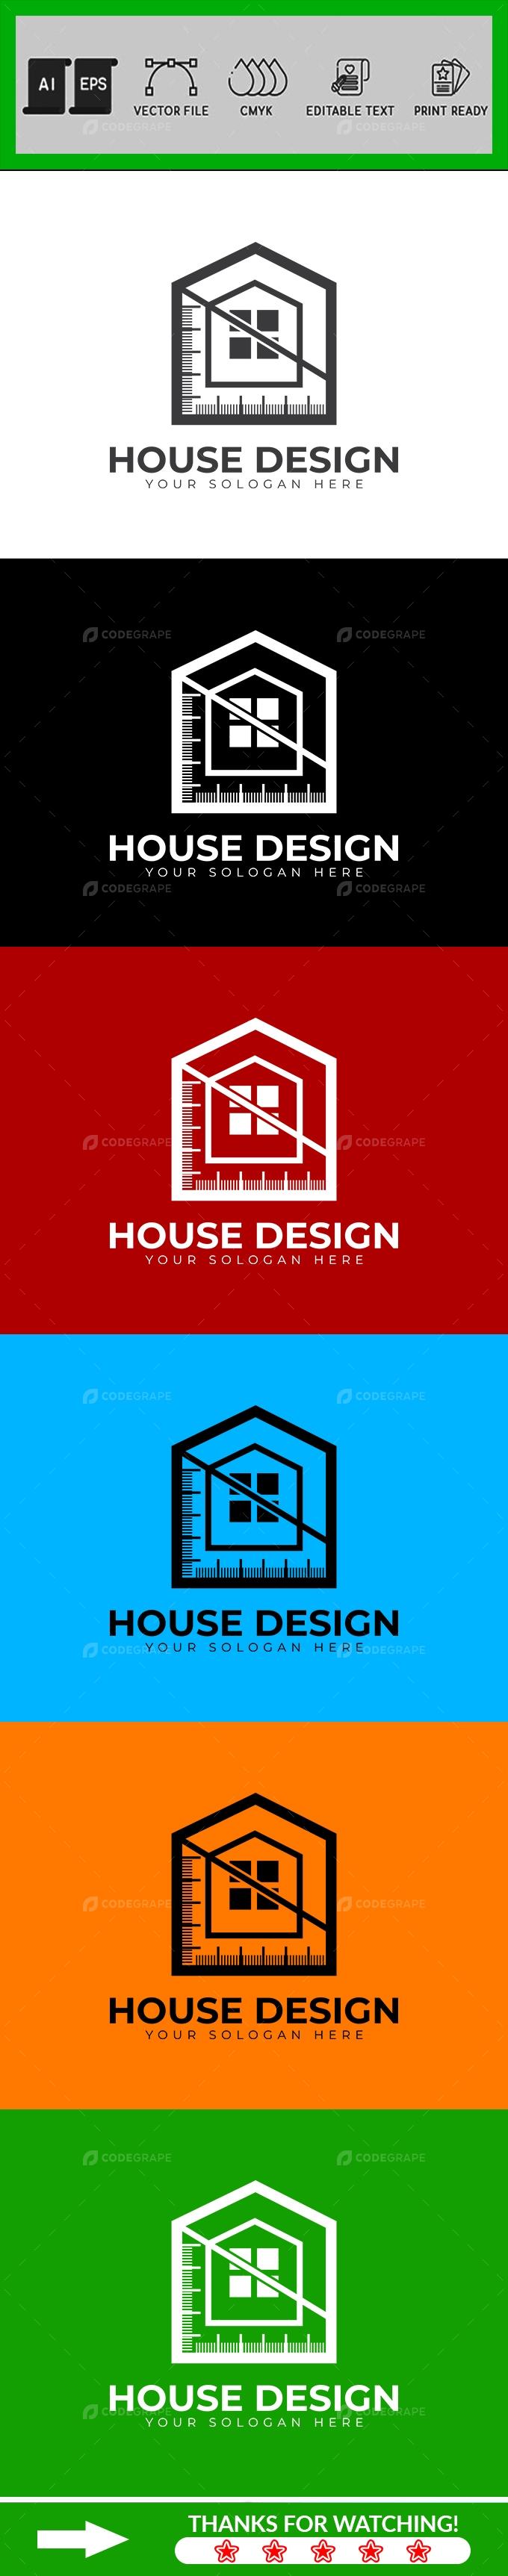 House Design  Architecture Logo Design Template